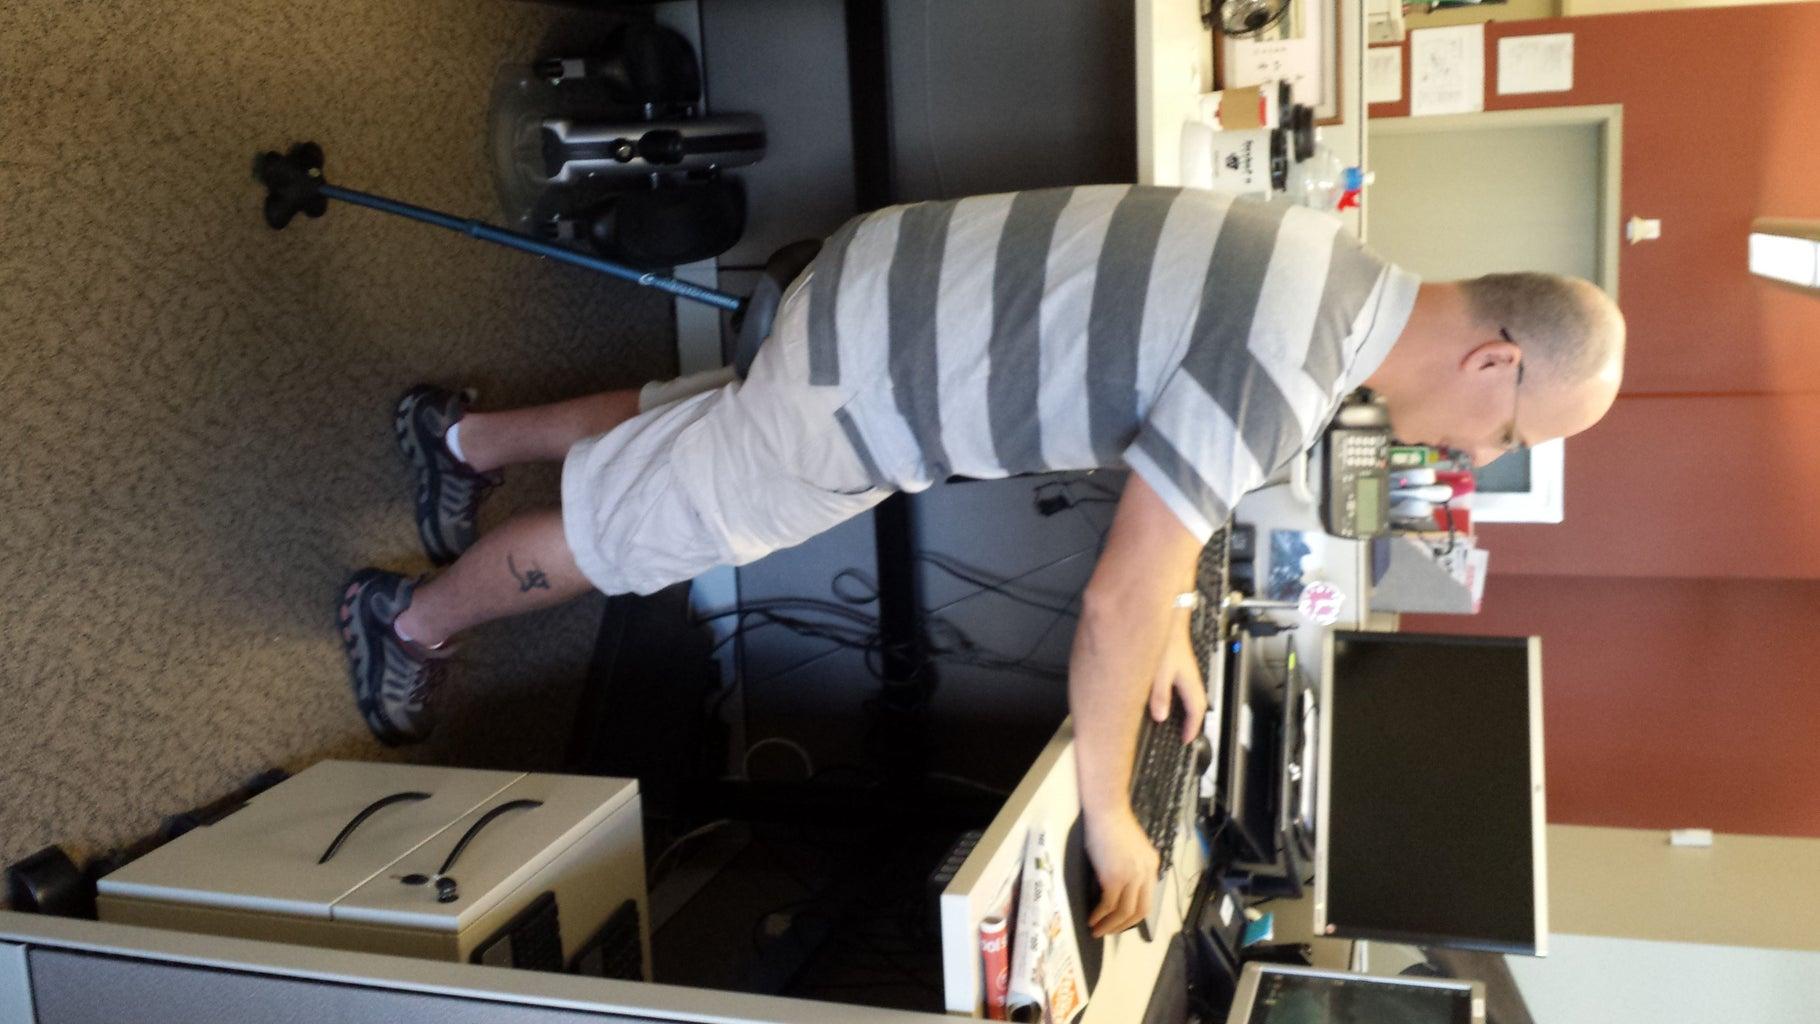 Leaning Stool / Human Kickstand / Wobble Chair